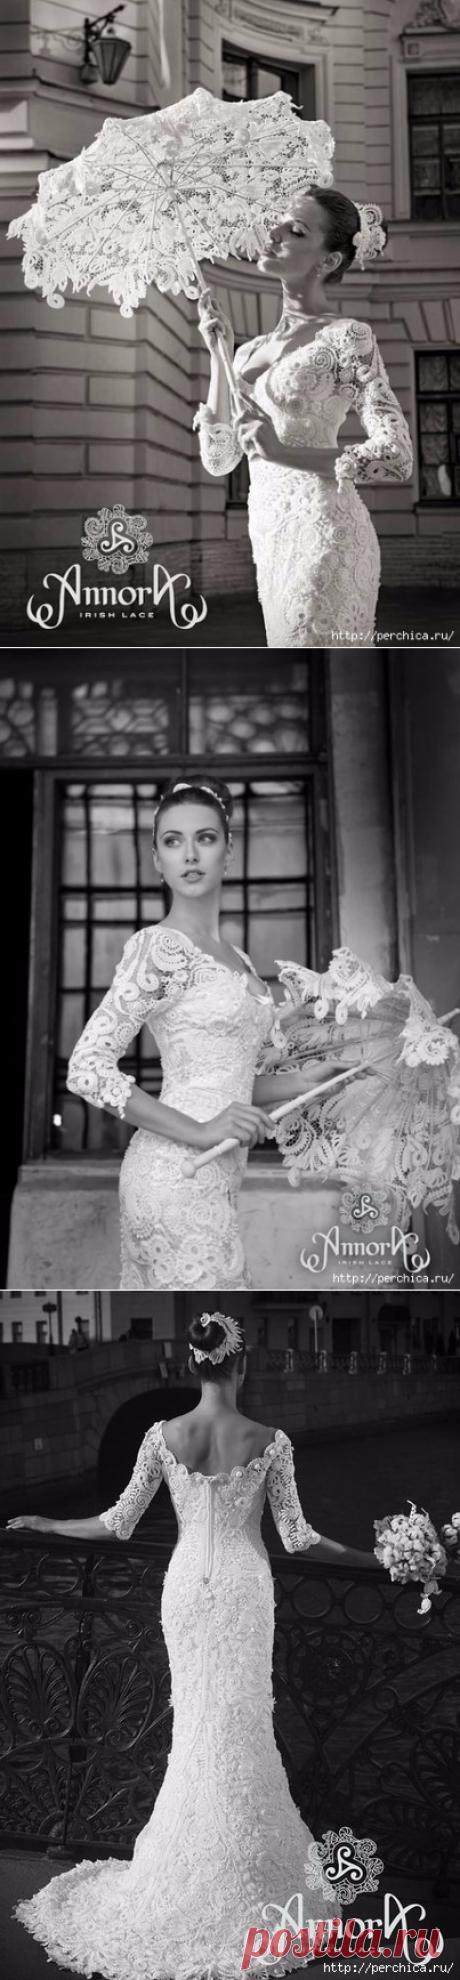 Шикарное платье *Quin* ирландское кружево (Annora) - схемы и мастер-классы